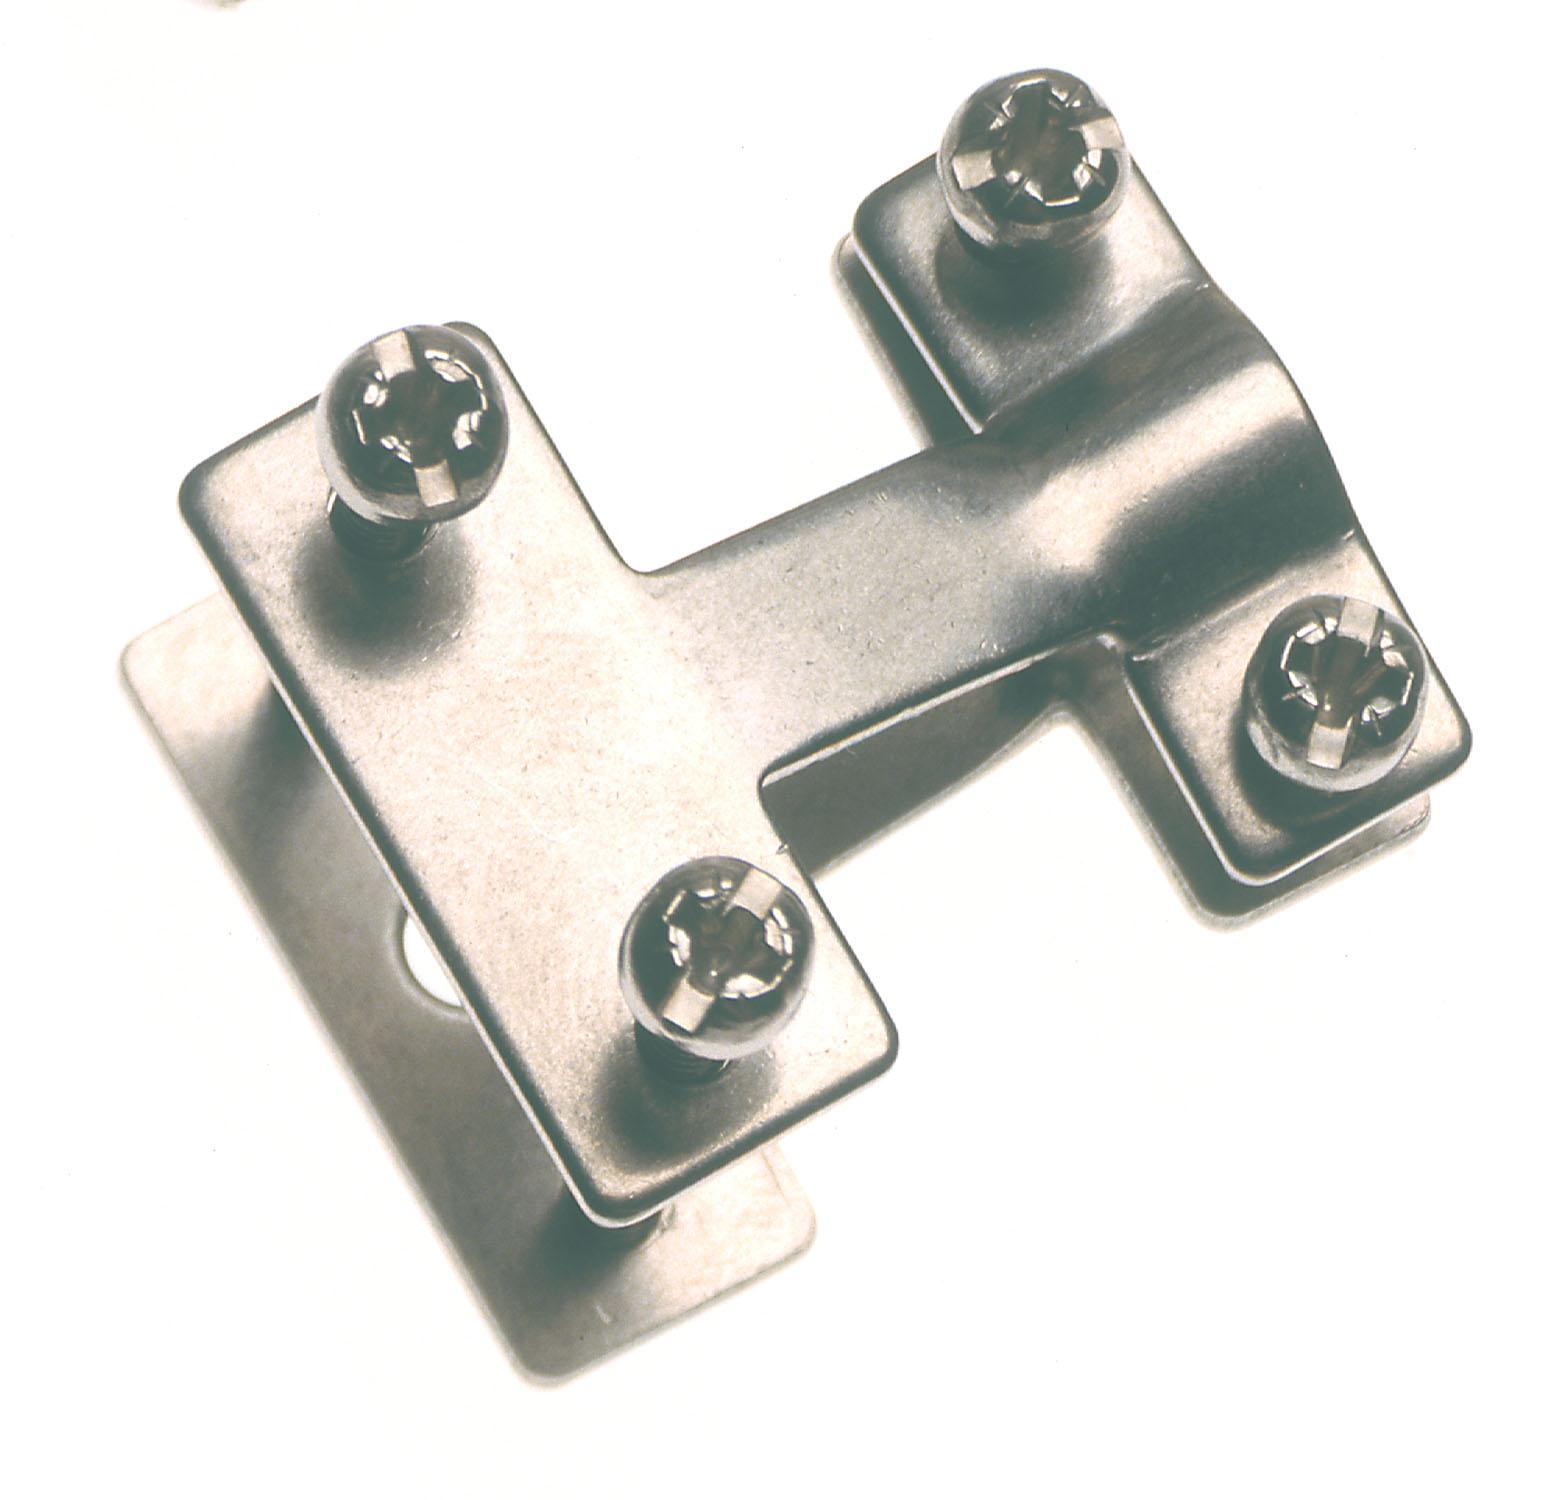 Accessoires de raccord thermocouple